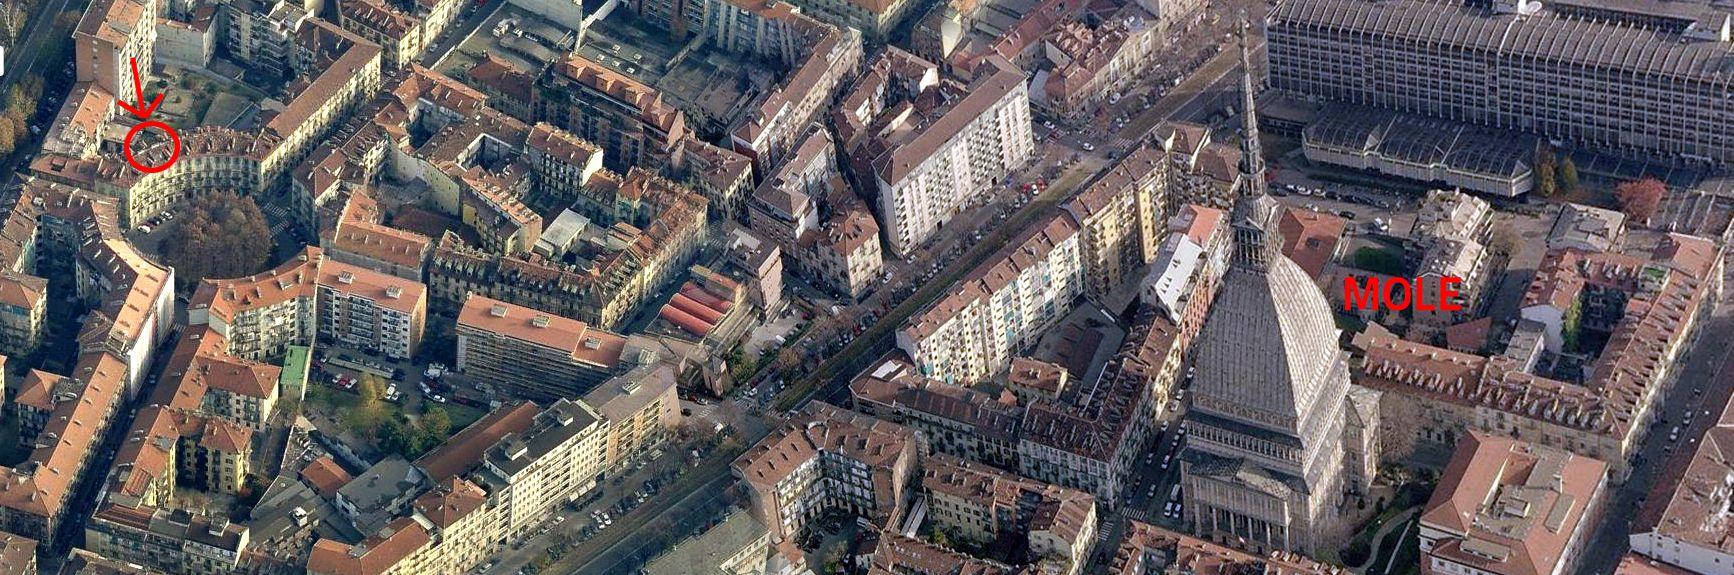 Vanchiglia, Turin, Piemonte, Italien